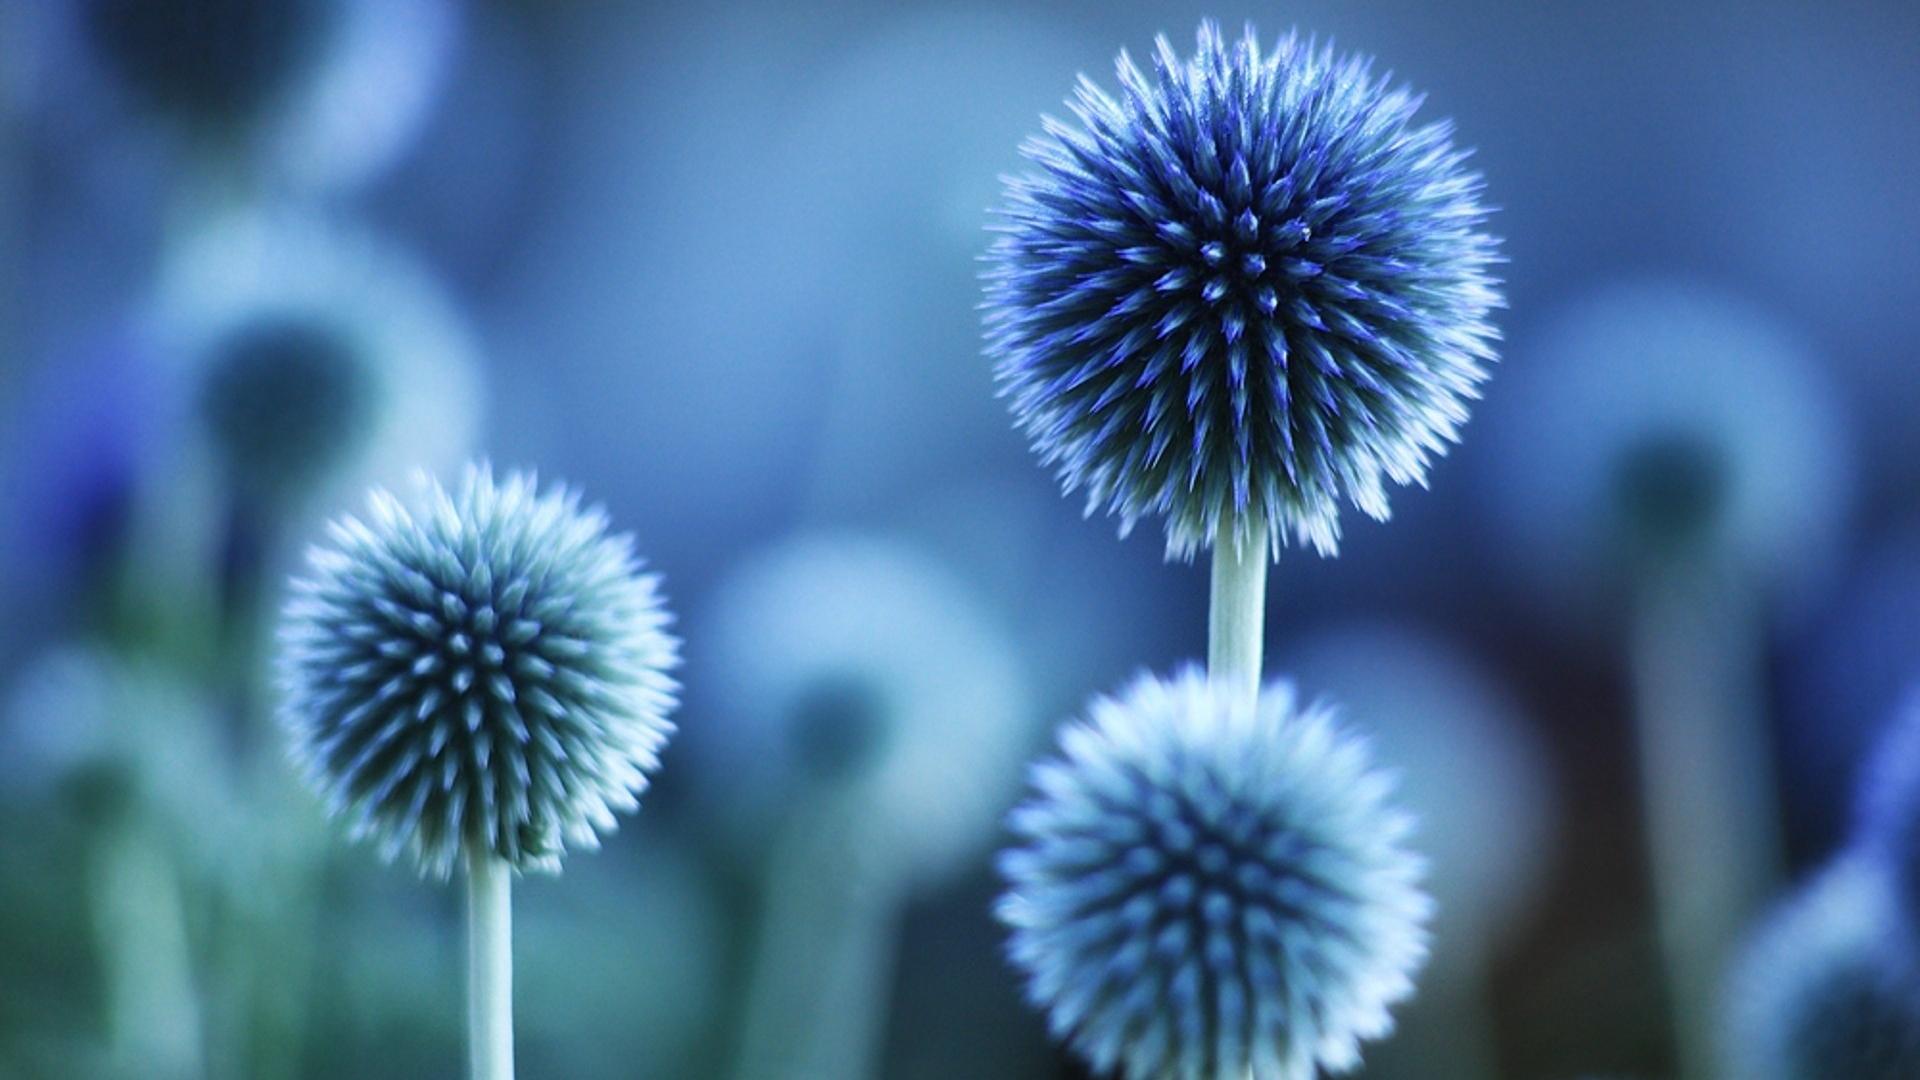 Free Download Amazing Nature Flower Wallpaper Download Wallpaper